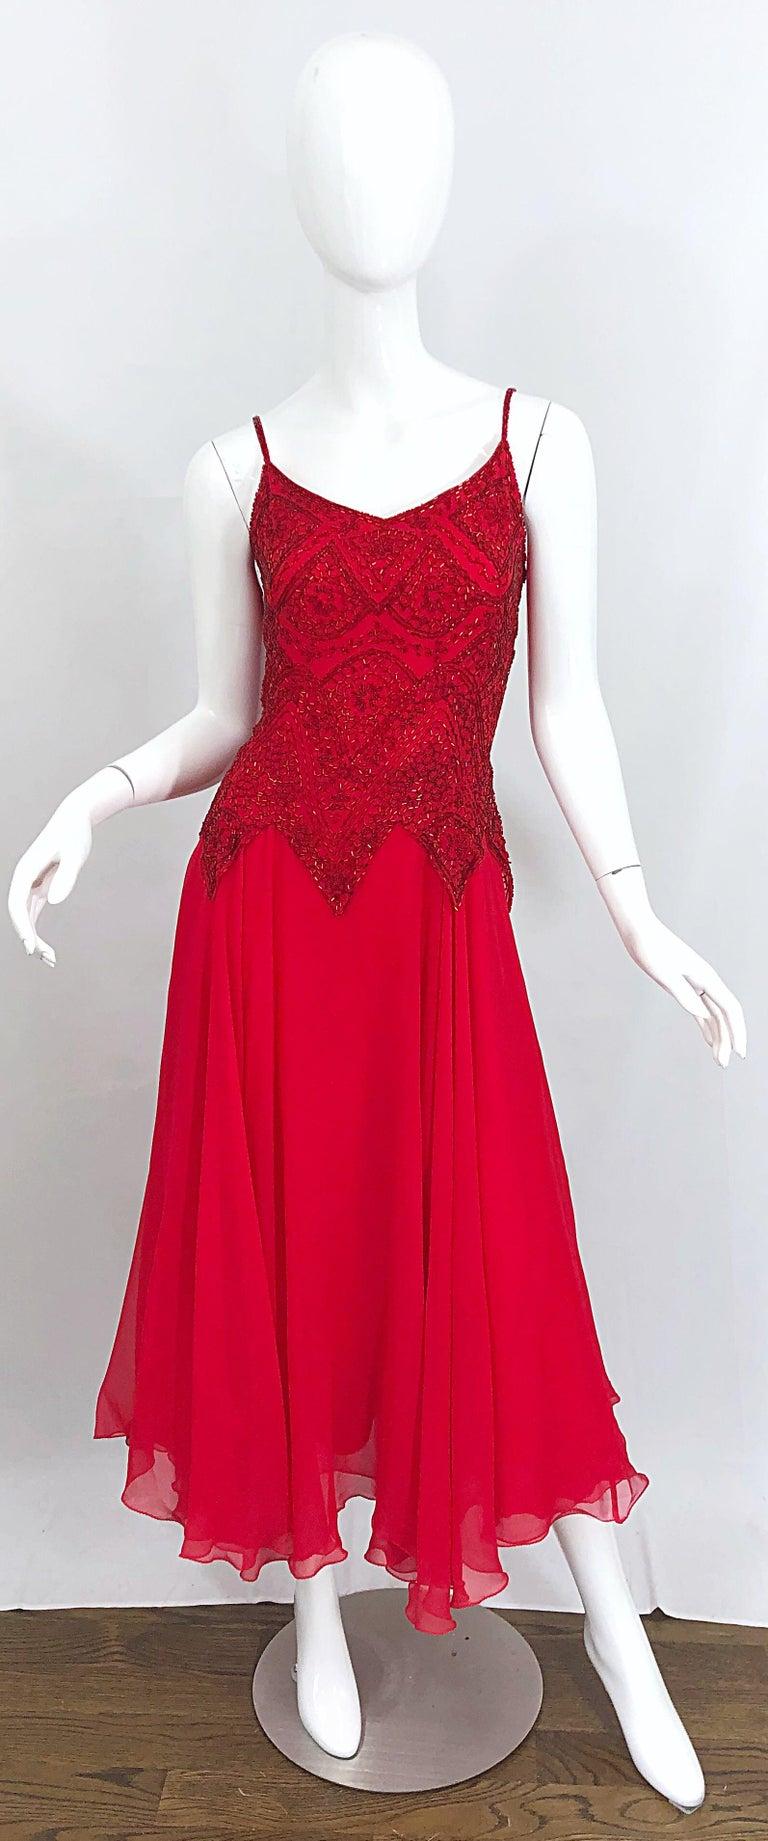 1970s Oleg Cassini Size 10 / 12 Red Silk Chiffon Beaded Handkerchief Midi Dress For Sale 10